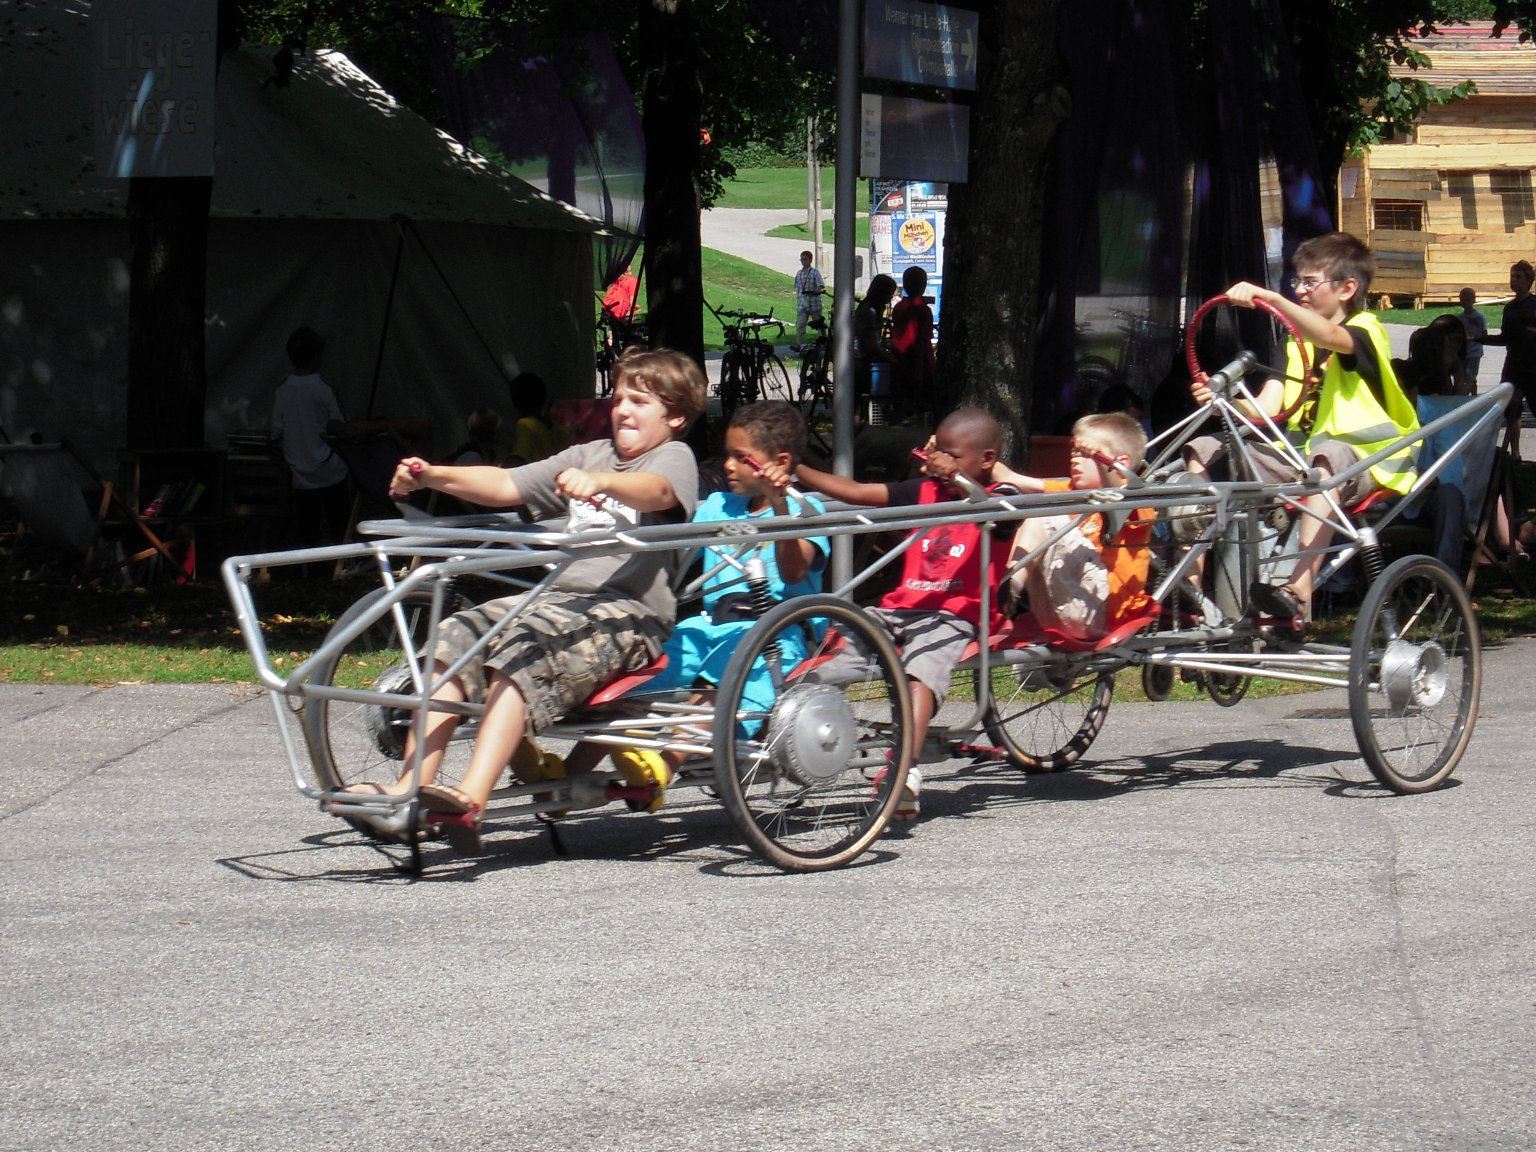 CHILDREN TRANSPORTATION